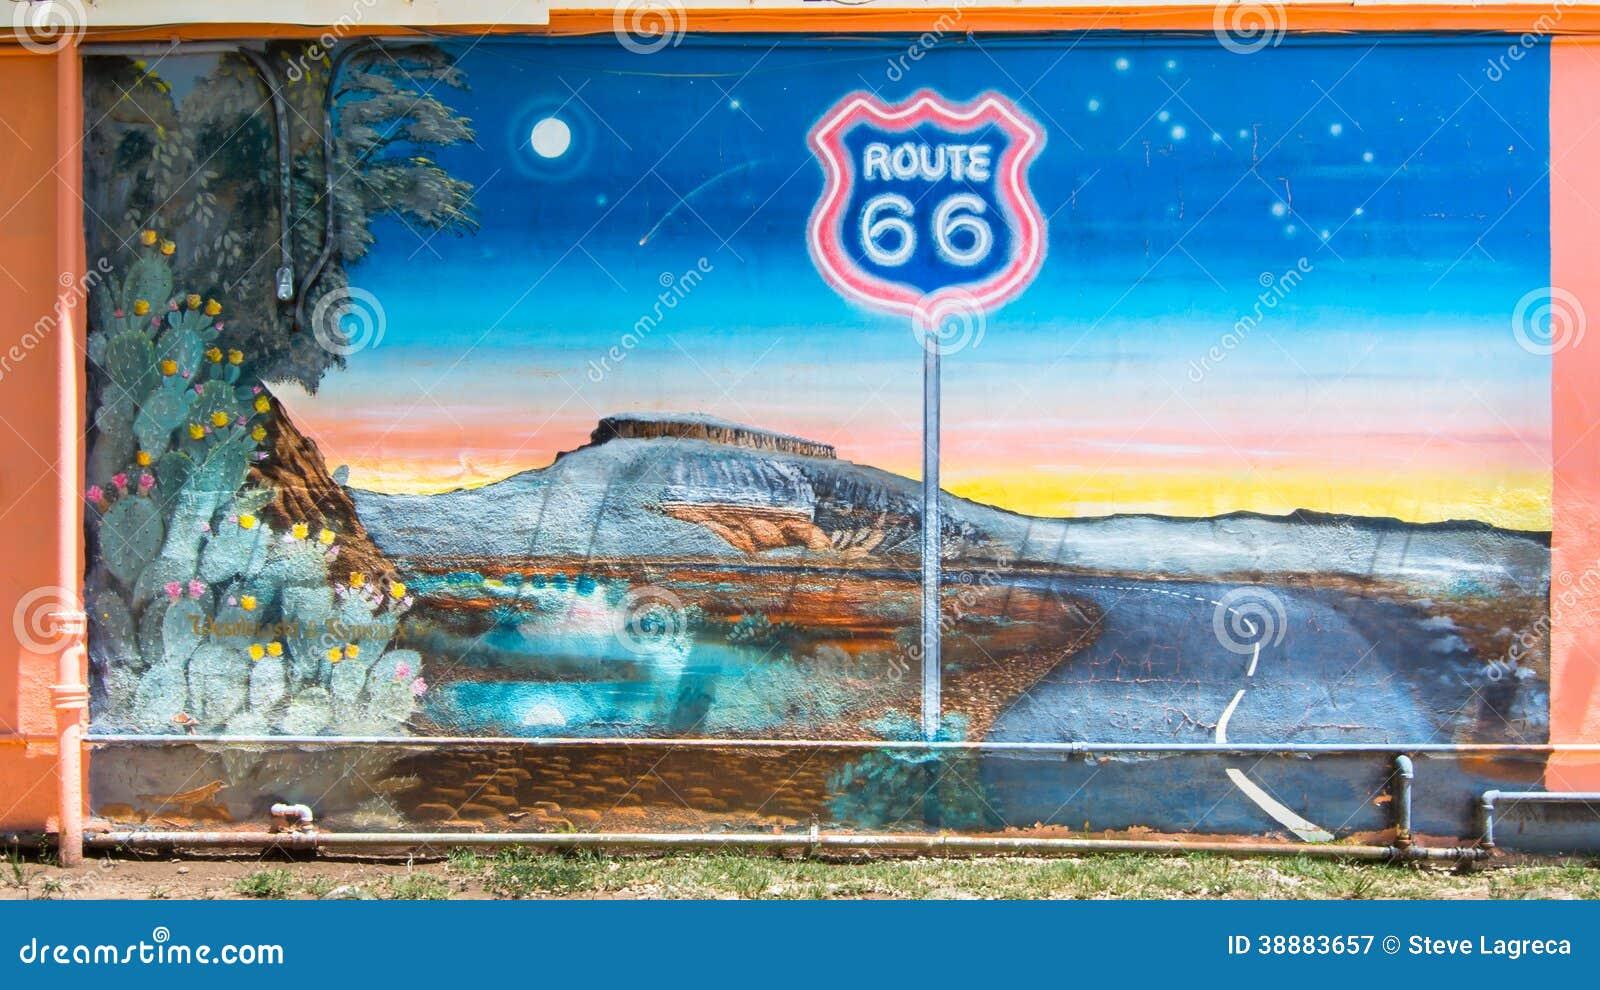 Route 66 route 66 mural tucumcari nm editorial for Route 66 mural